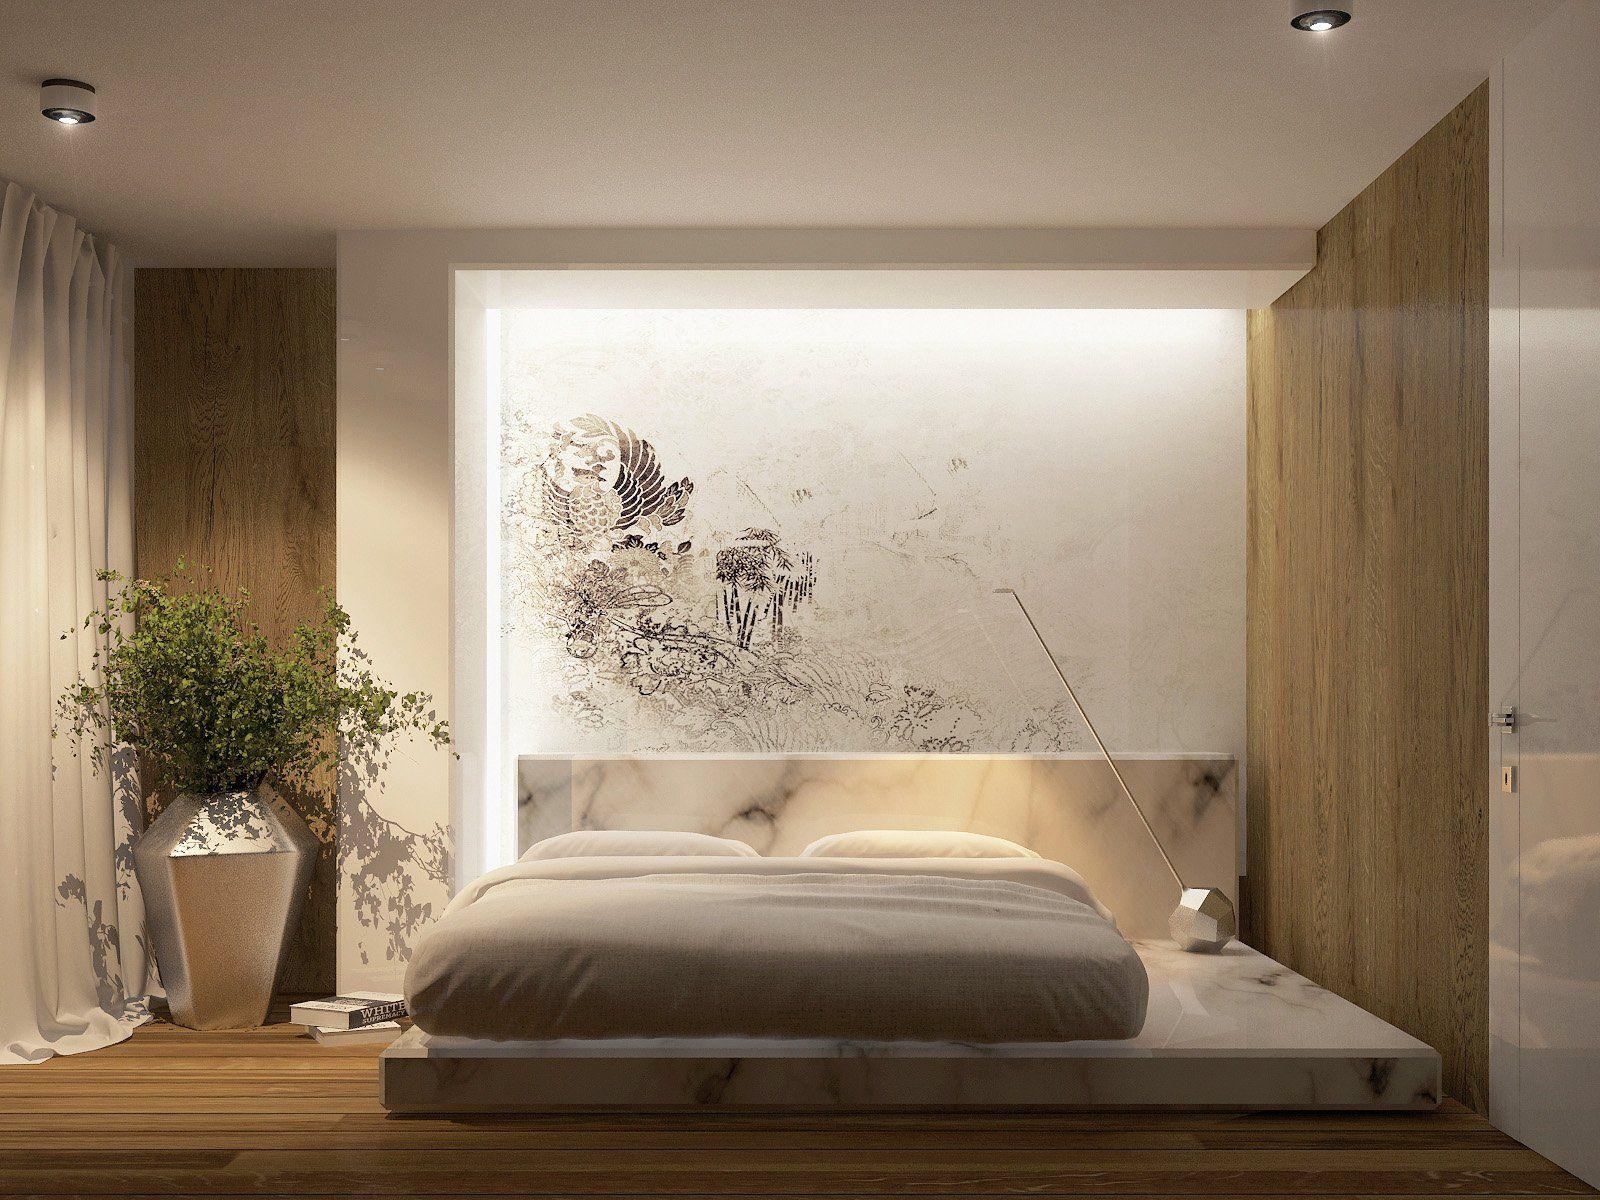 Master Bedroom Minimalist Design Mesmerizing 16 Breathtaking Minimalist Interior Design Ideas  Minimalist Decorating Inspiration